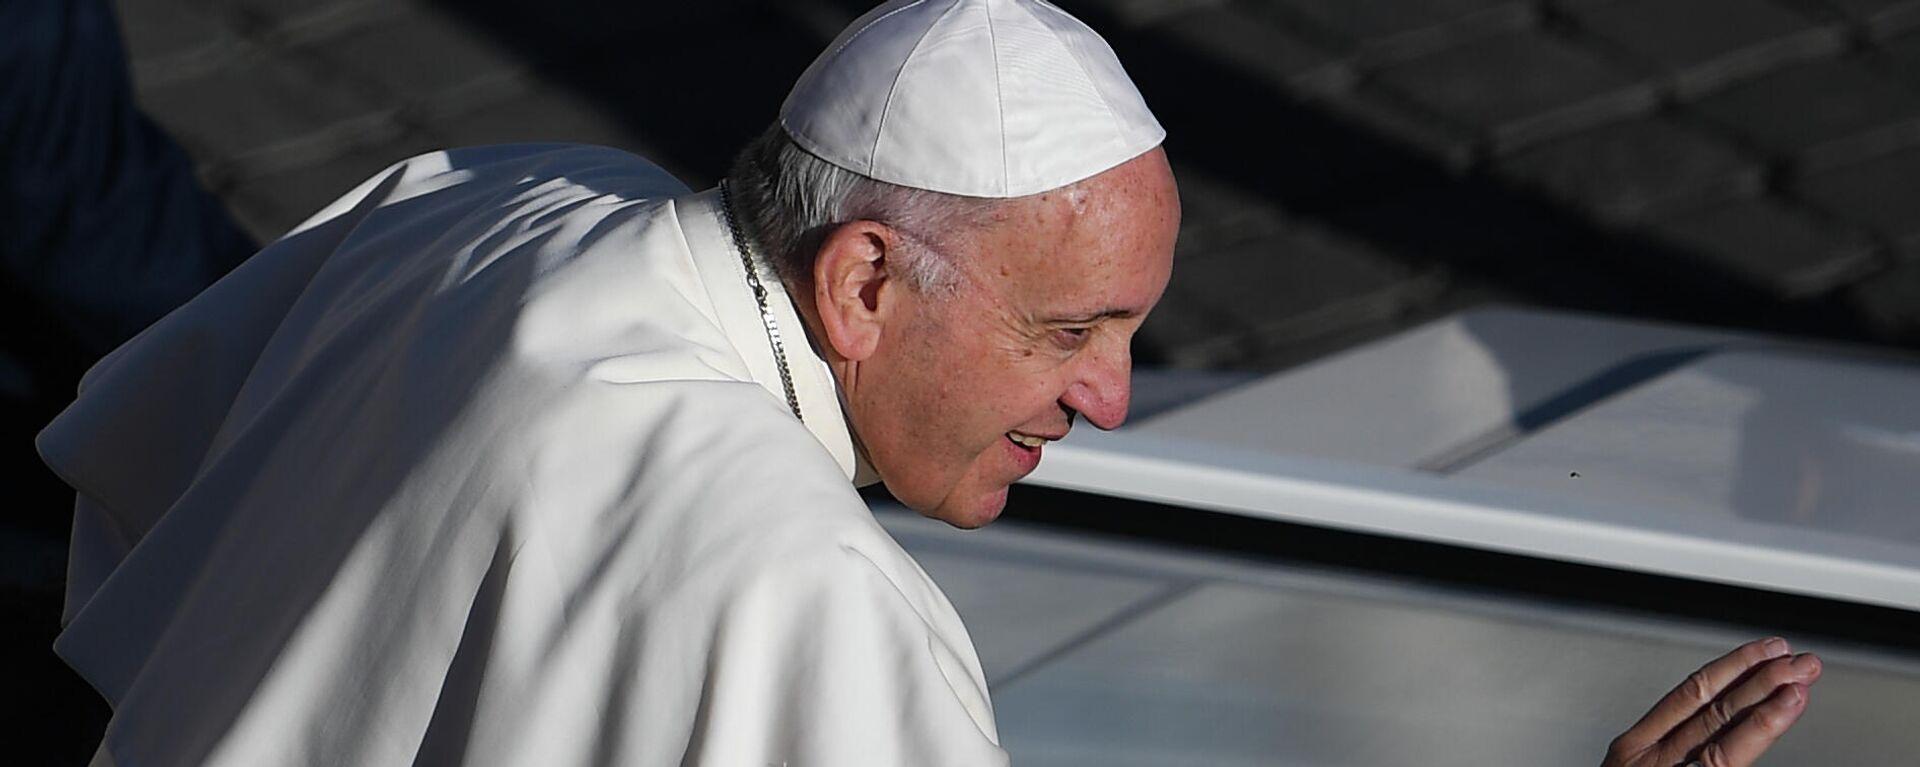 Papa Francesco - Sputnik Italia, 1920, 09.08.2021